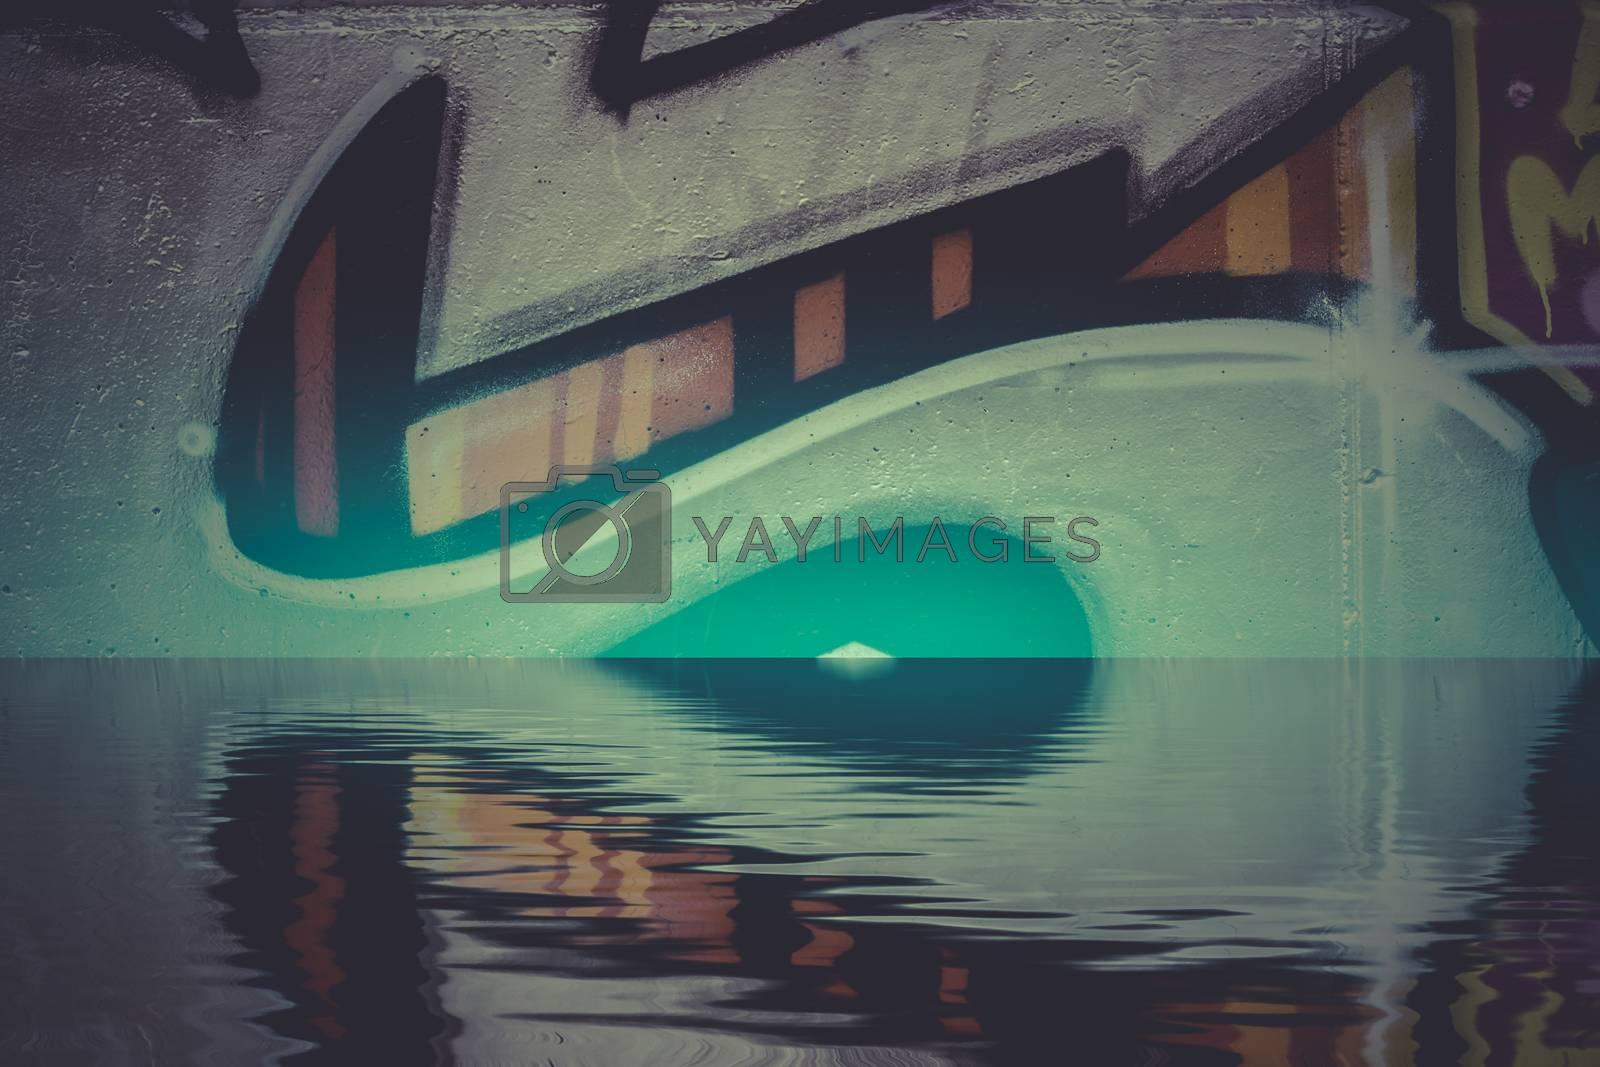 Graffiti reflection in the water, artistic urban arrows